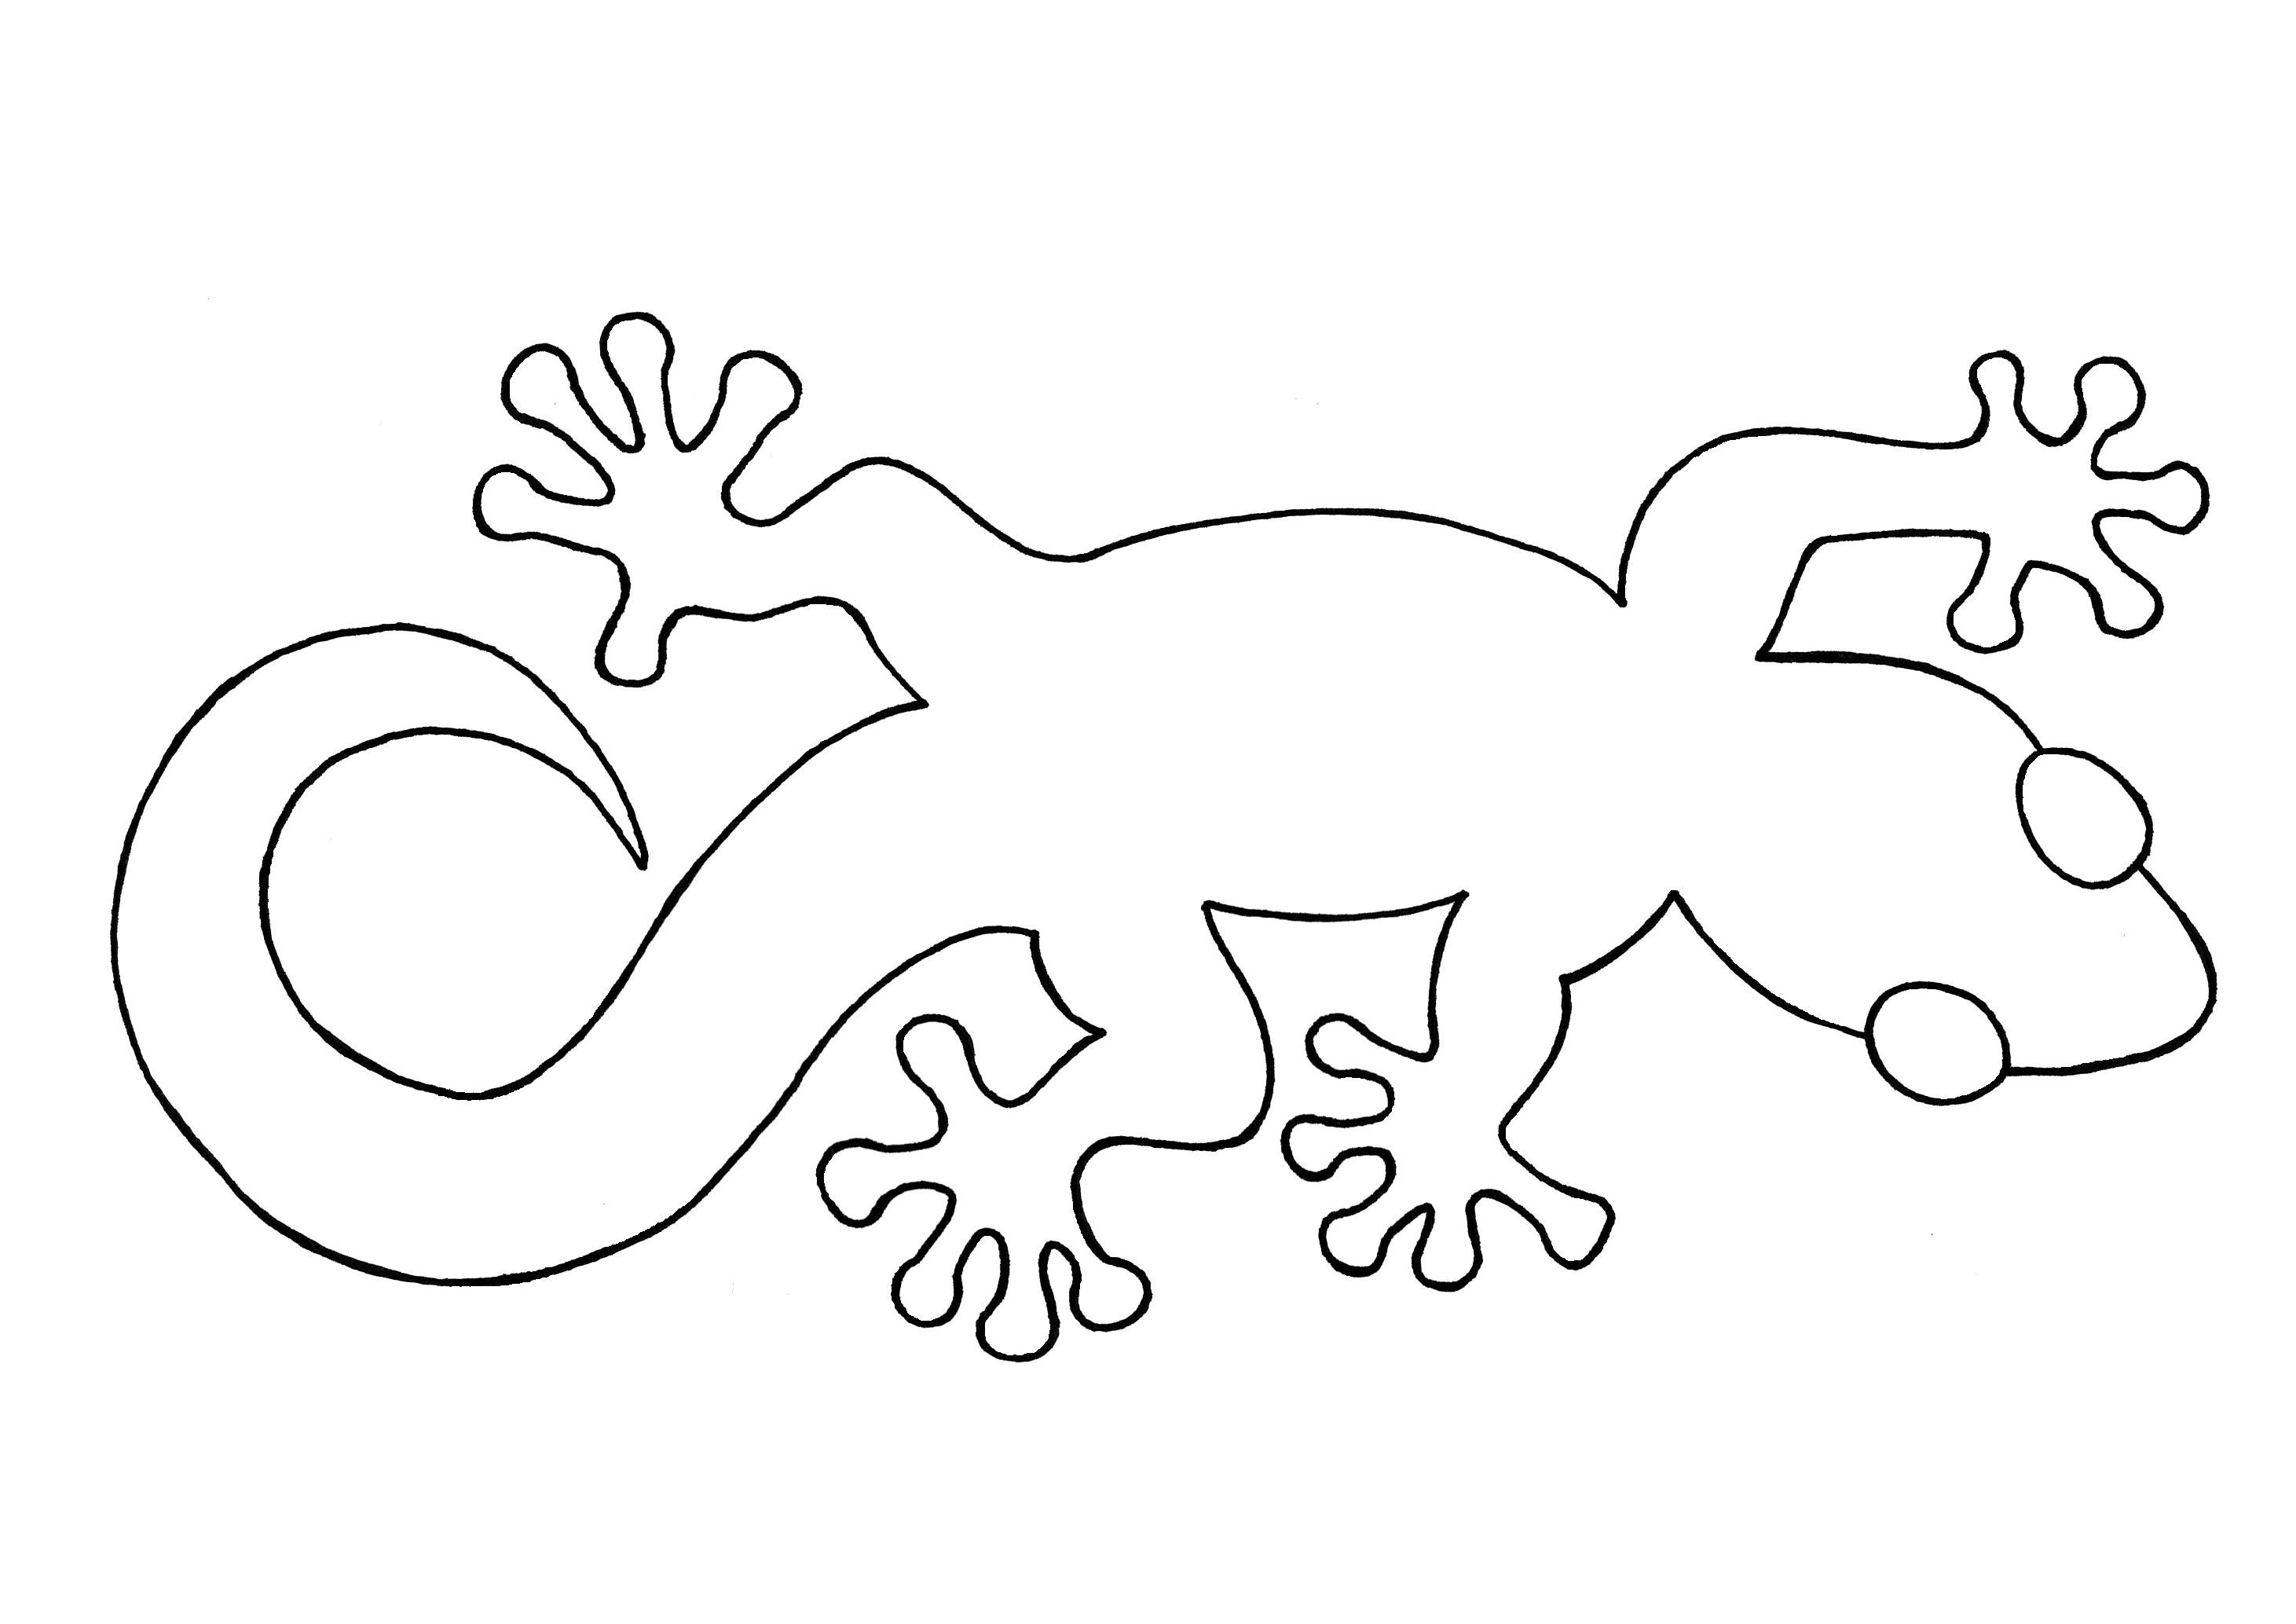 TB719FV) Funky Gecko Geocoin - Funky Gecko 🦎 goes around the world